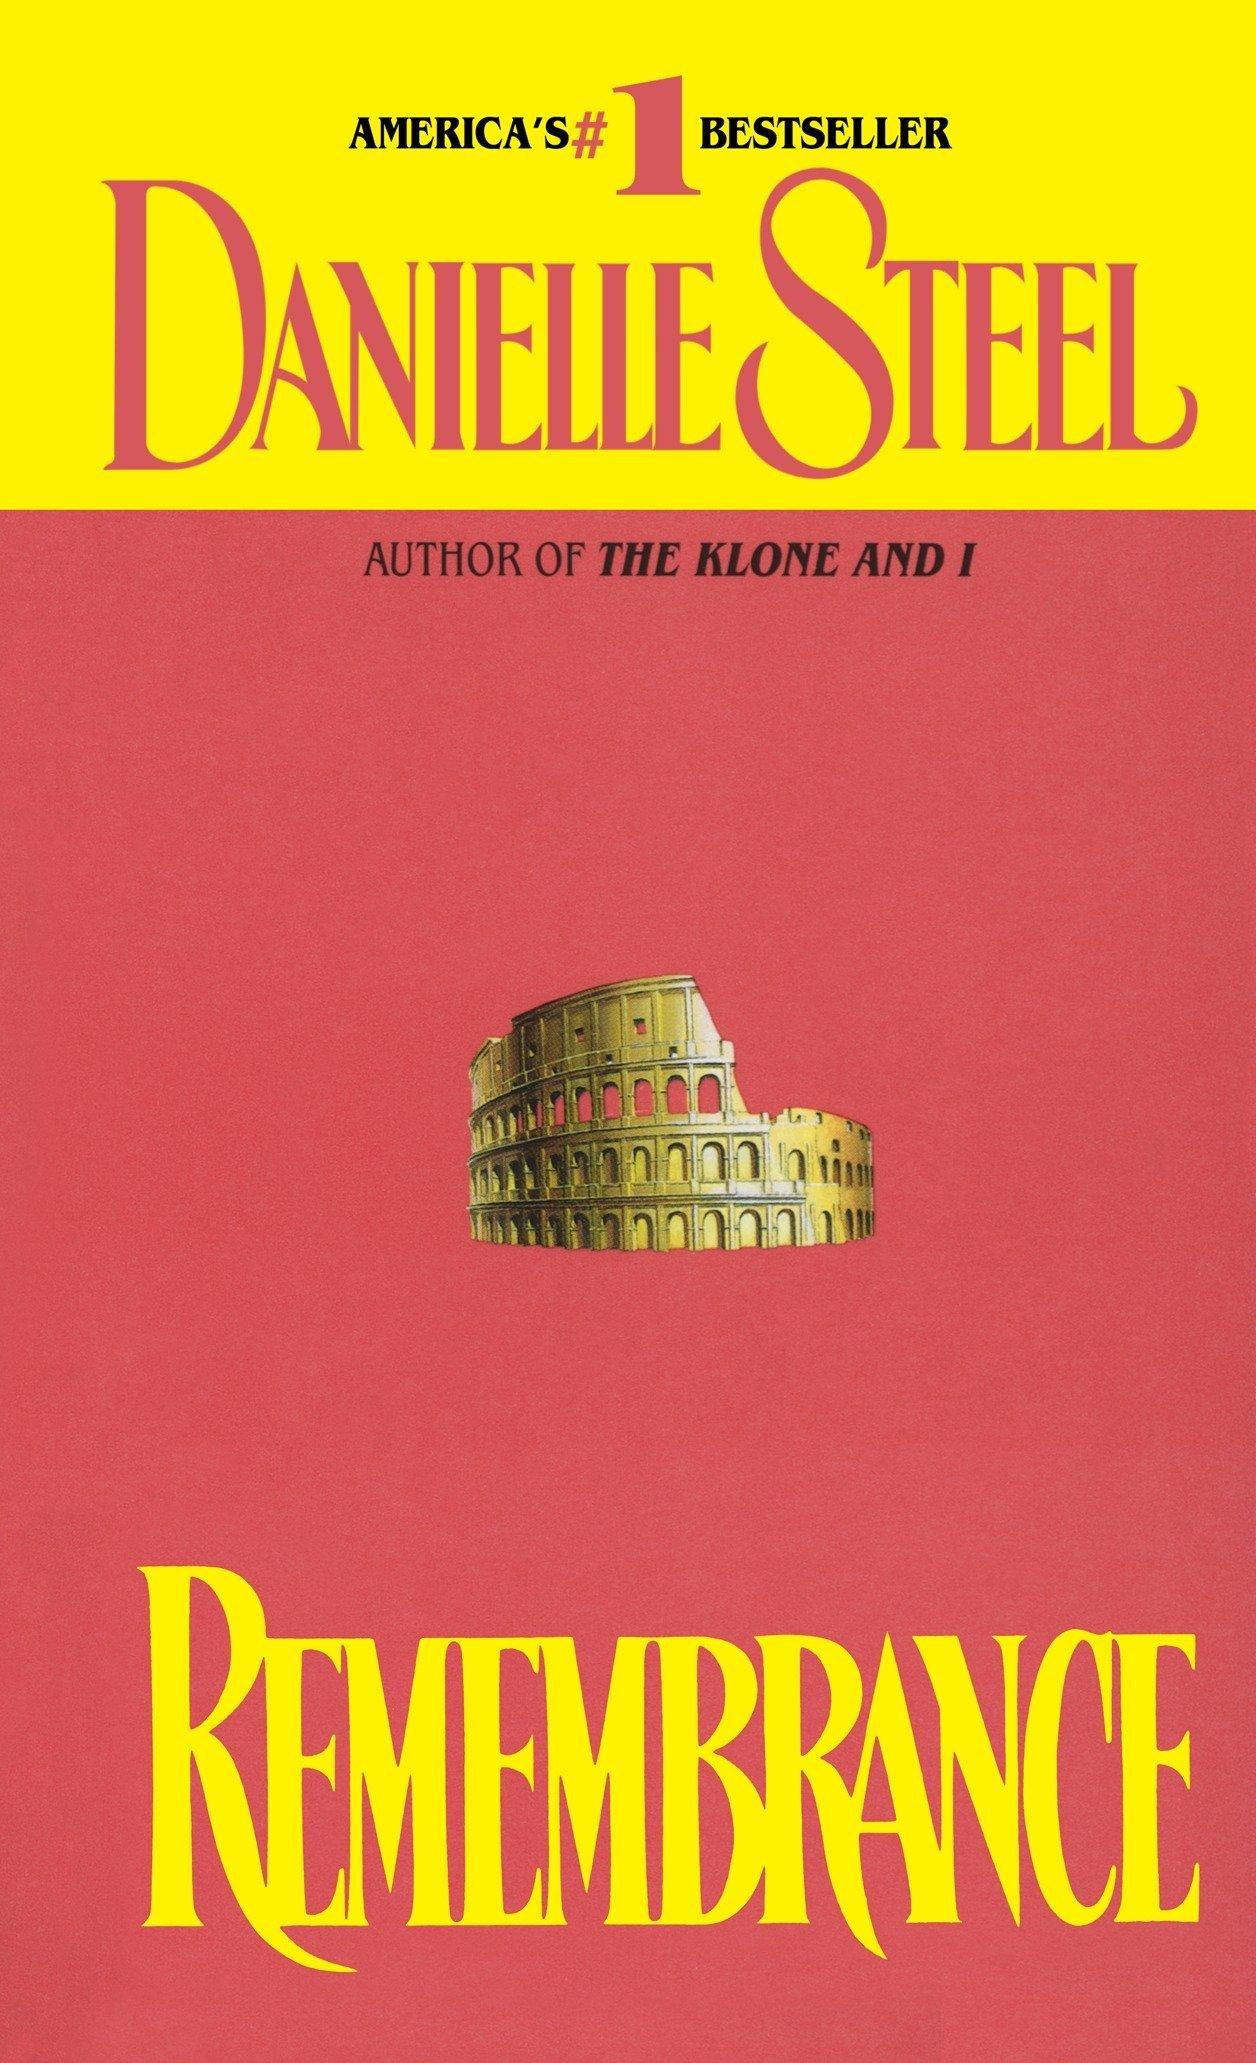 99dbfc7ffce5 Remembrance  A Novel  Danielle Steel  9780440173700  Amazon.com  Books